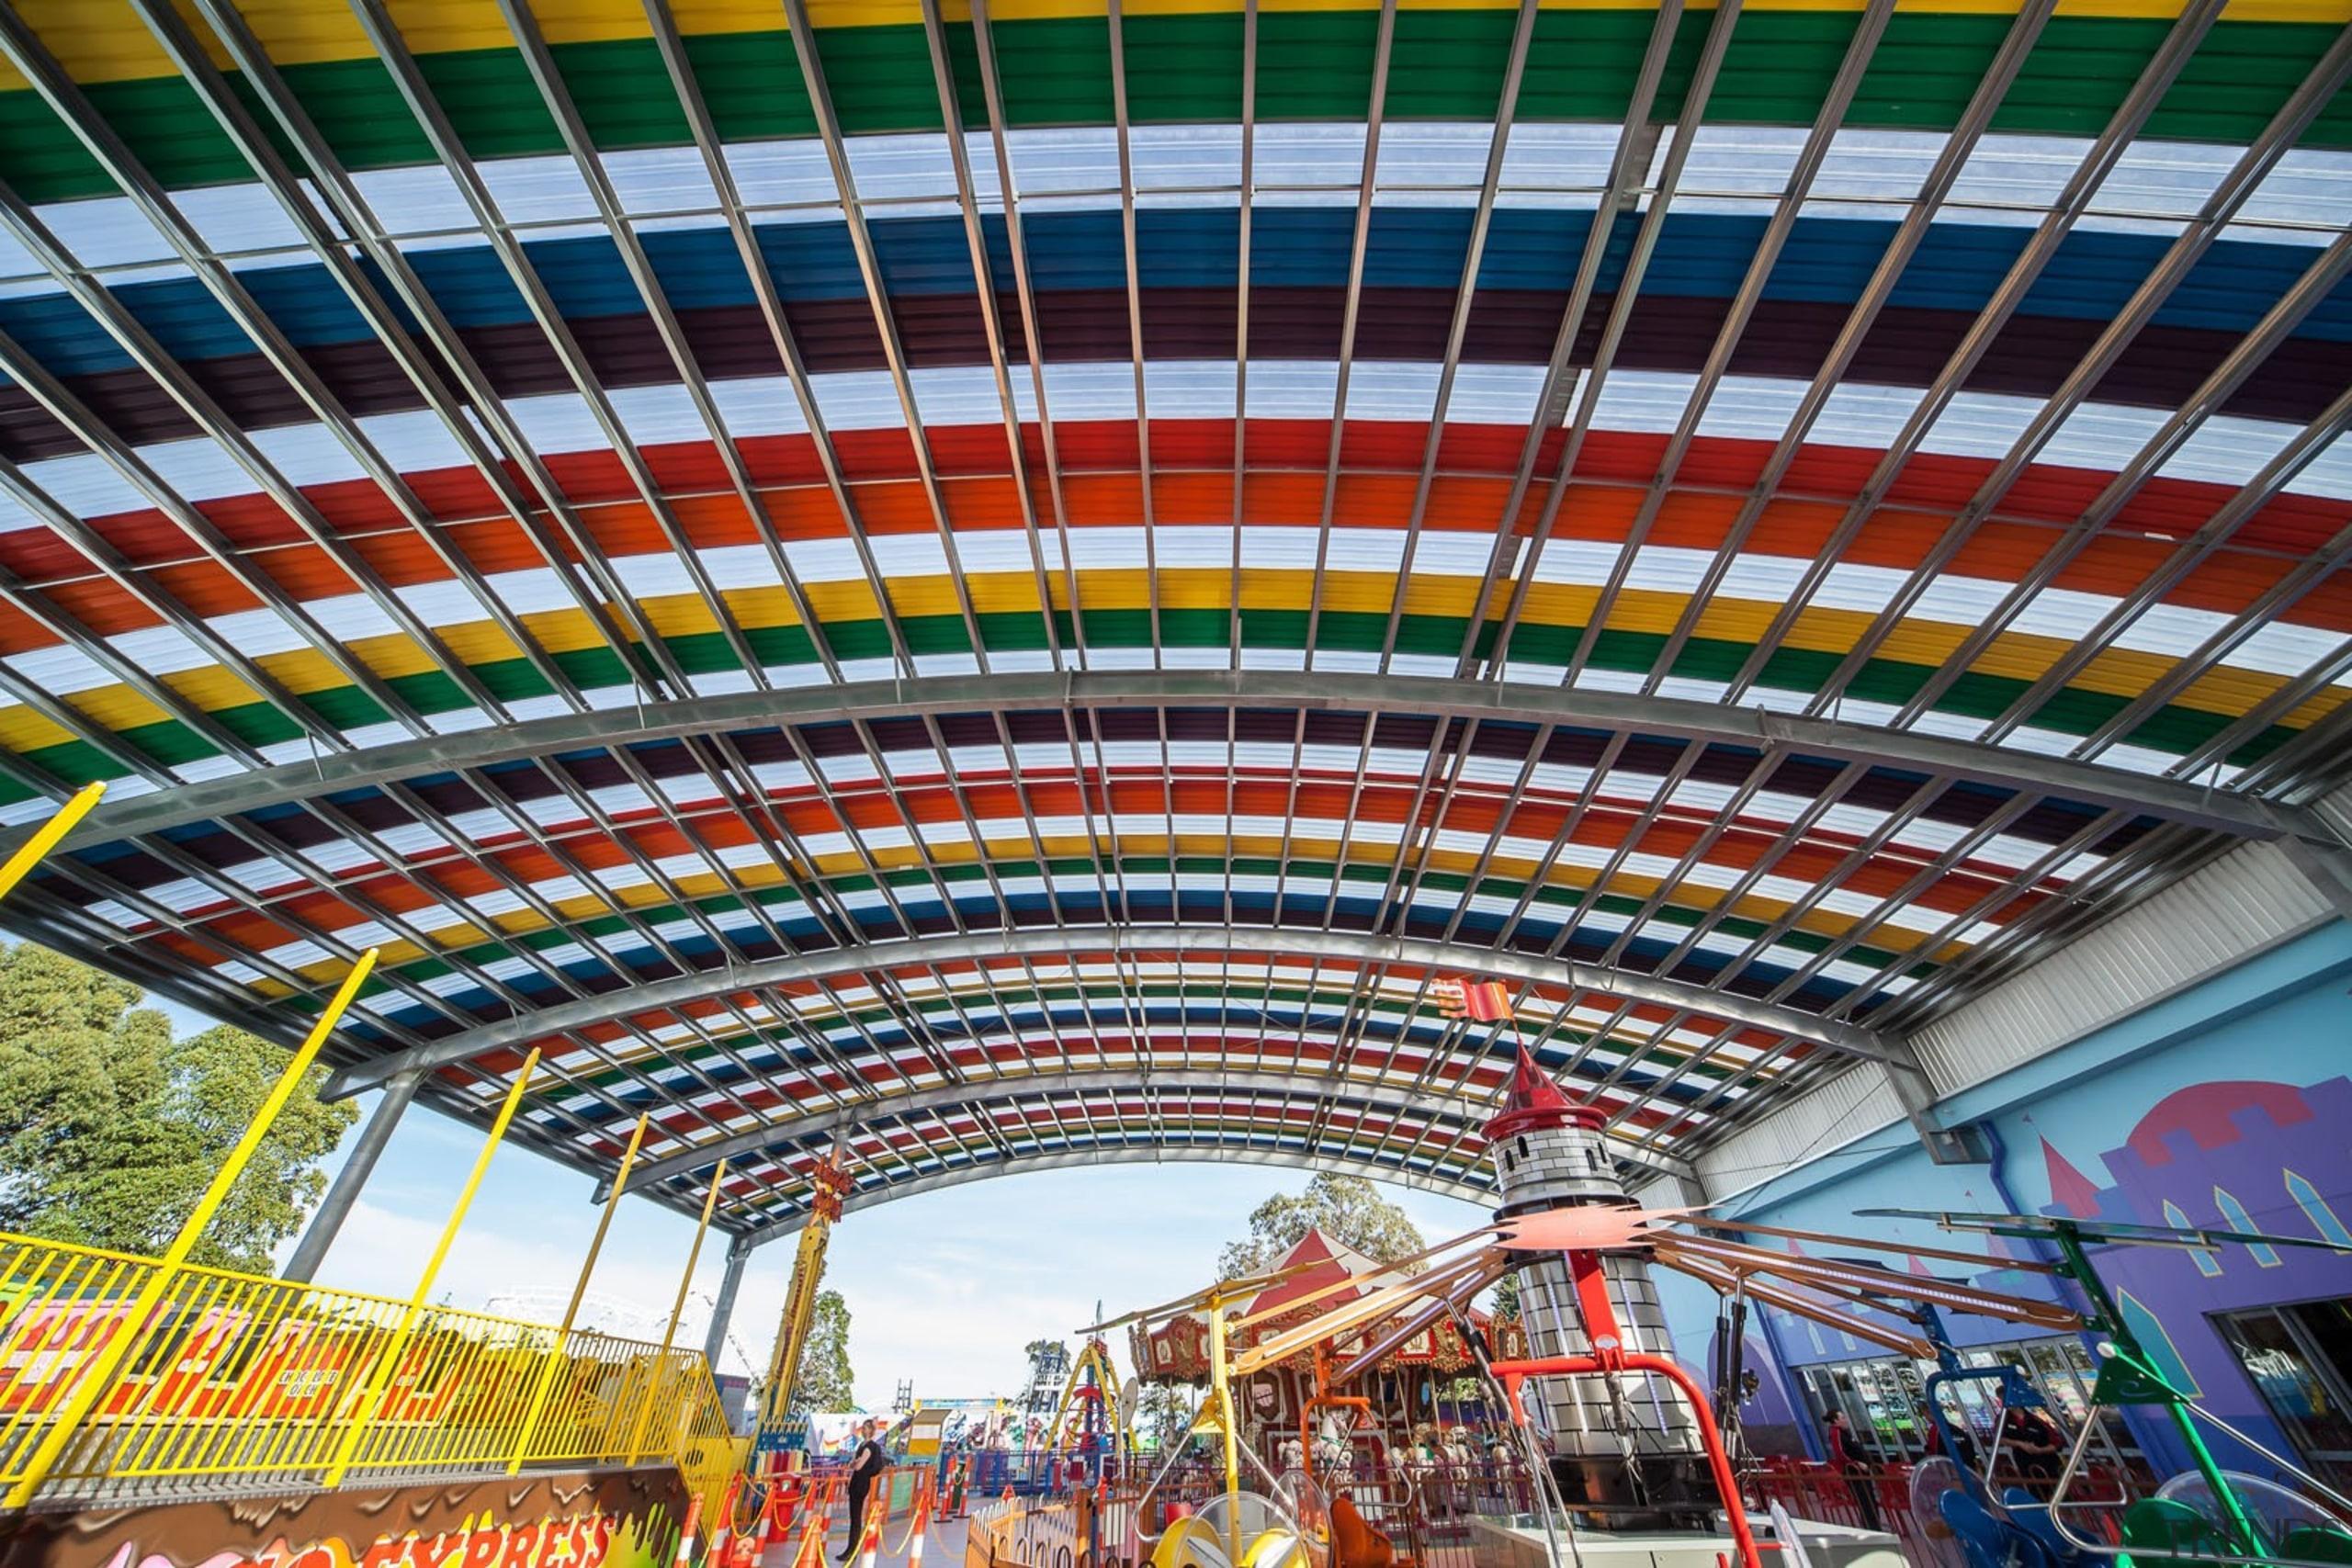 Dimond-Rainbows End - 22 - Dimond - Rainbows amusement park, amusement ride, fair, landmark, metropolitan area, sky, structure, tourist attraction, urban area